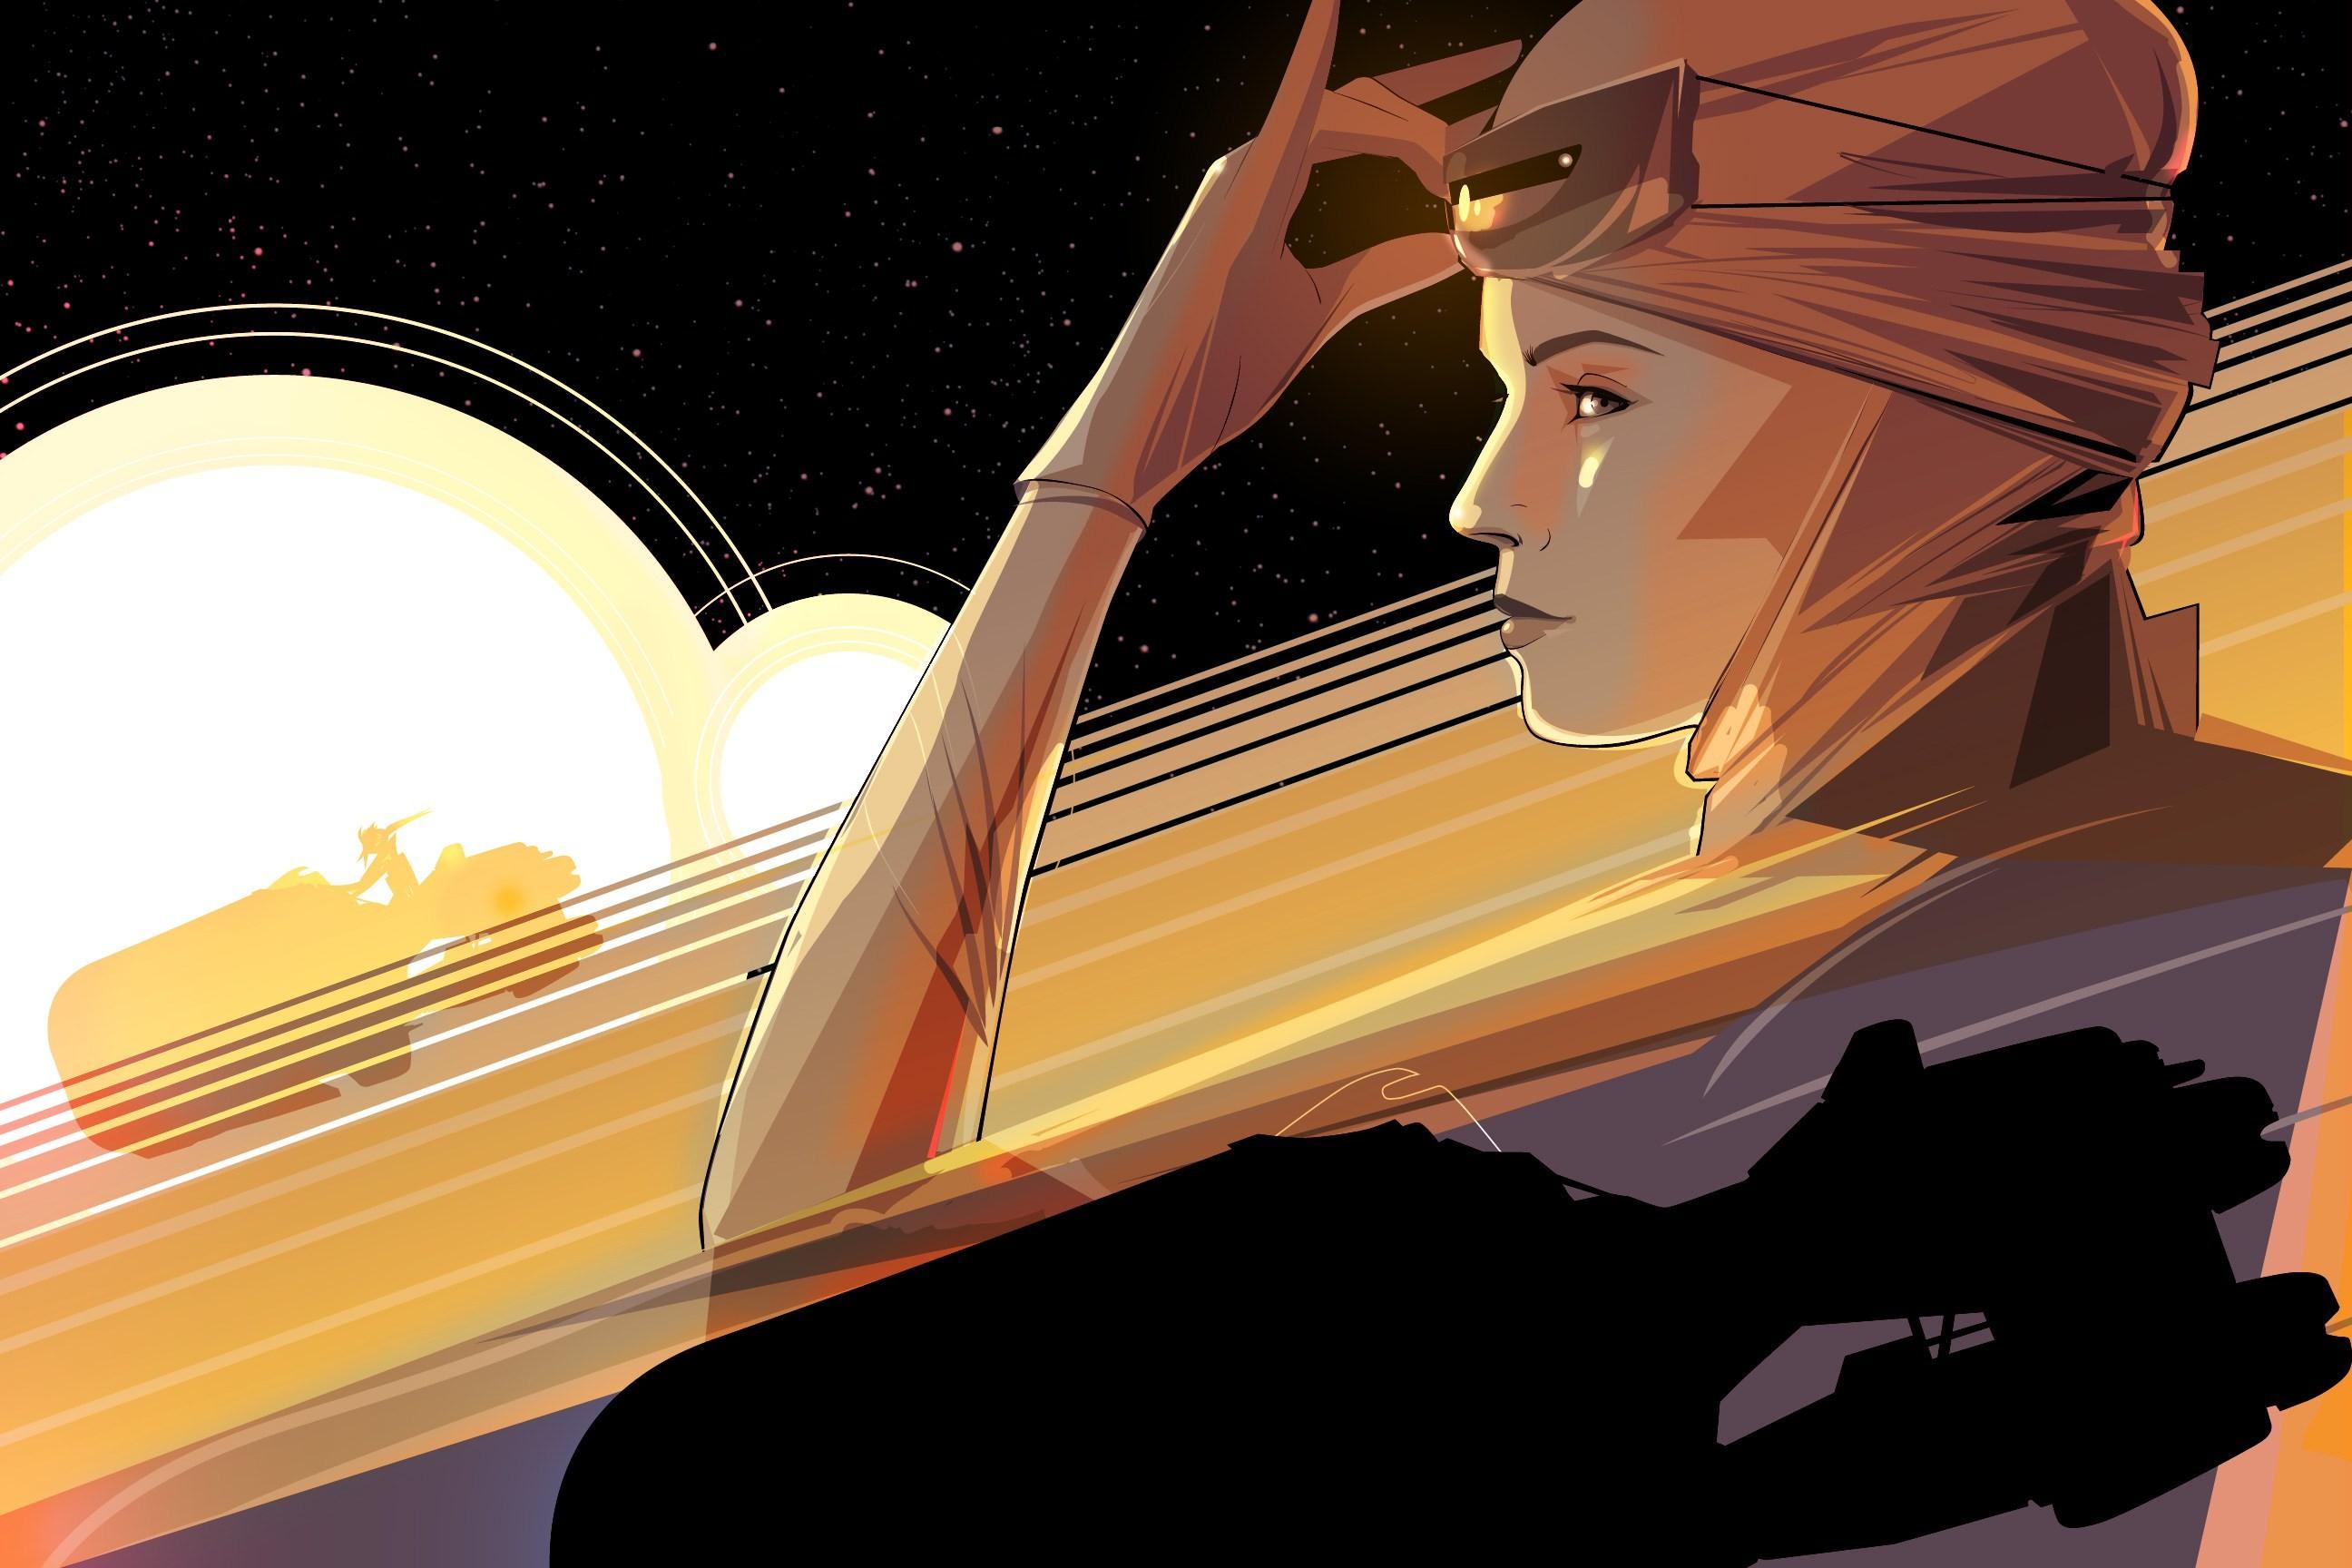 big 6b14f93ec89612382bb4ad35e2afdfbb339a4772 Star Wars: The Force Awakens Star Wars : The Force Awakens Rey illustration Craig Drake Art